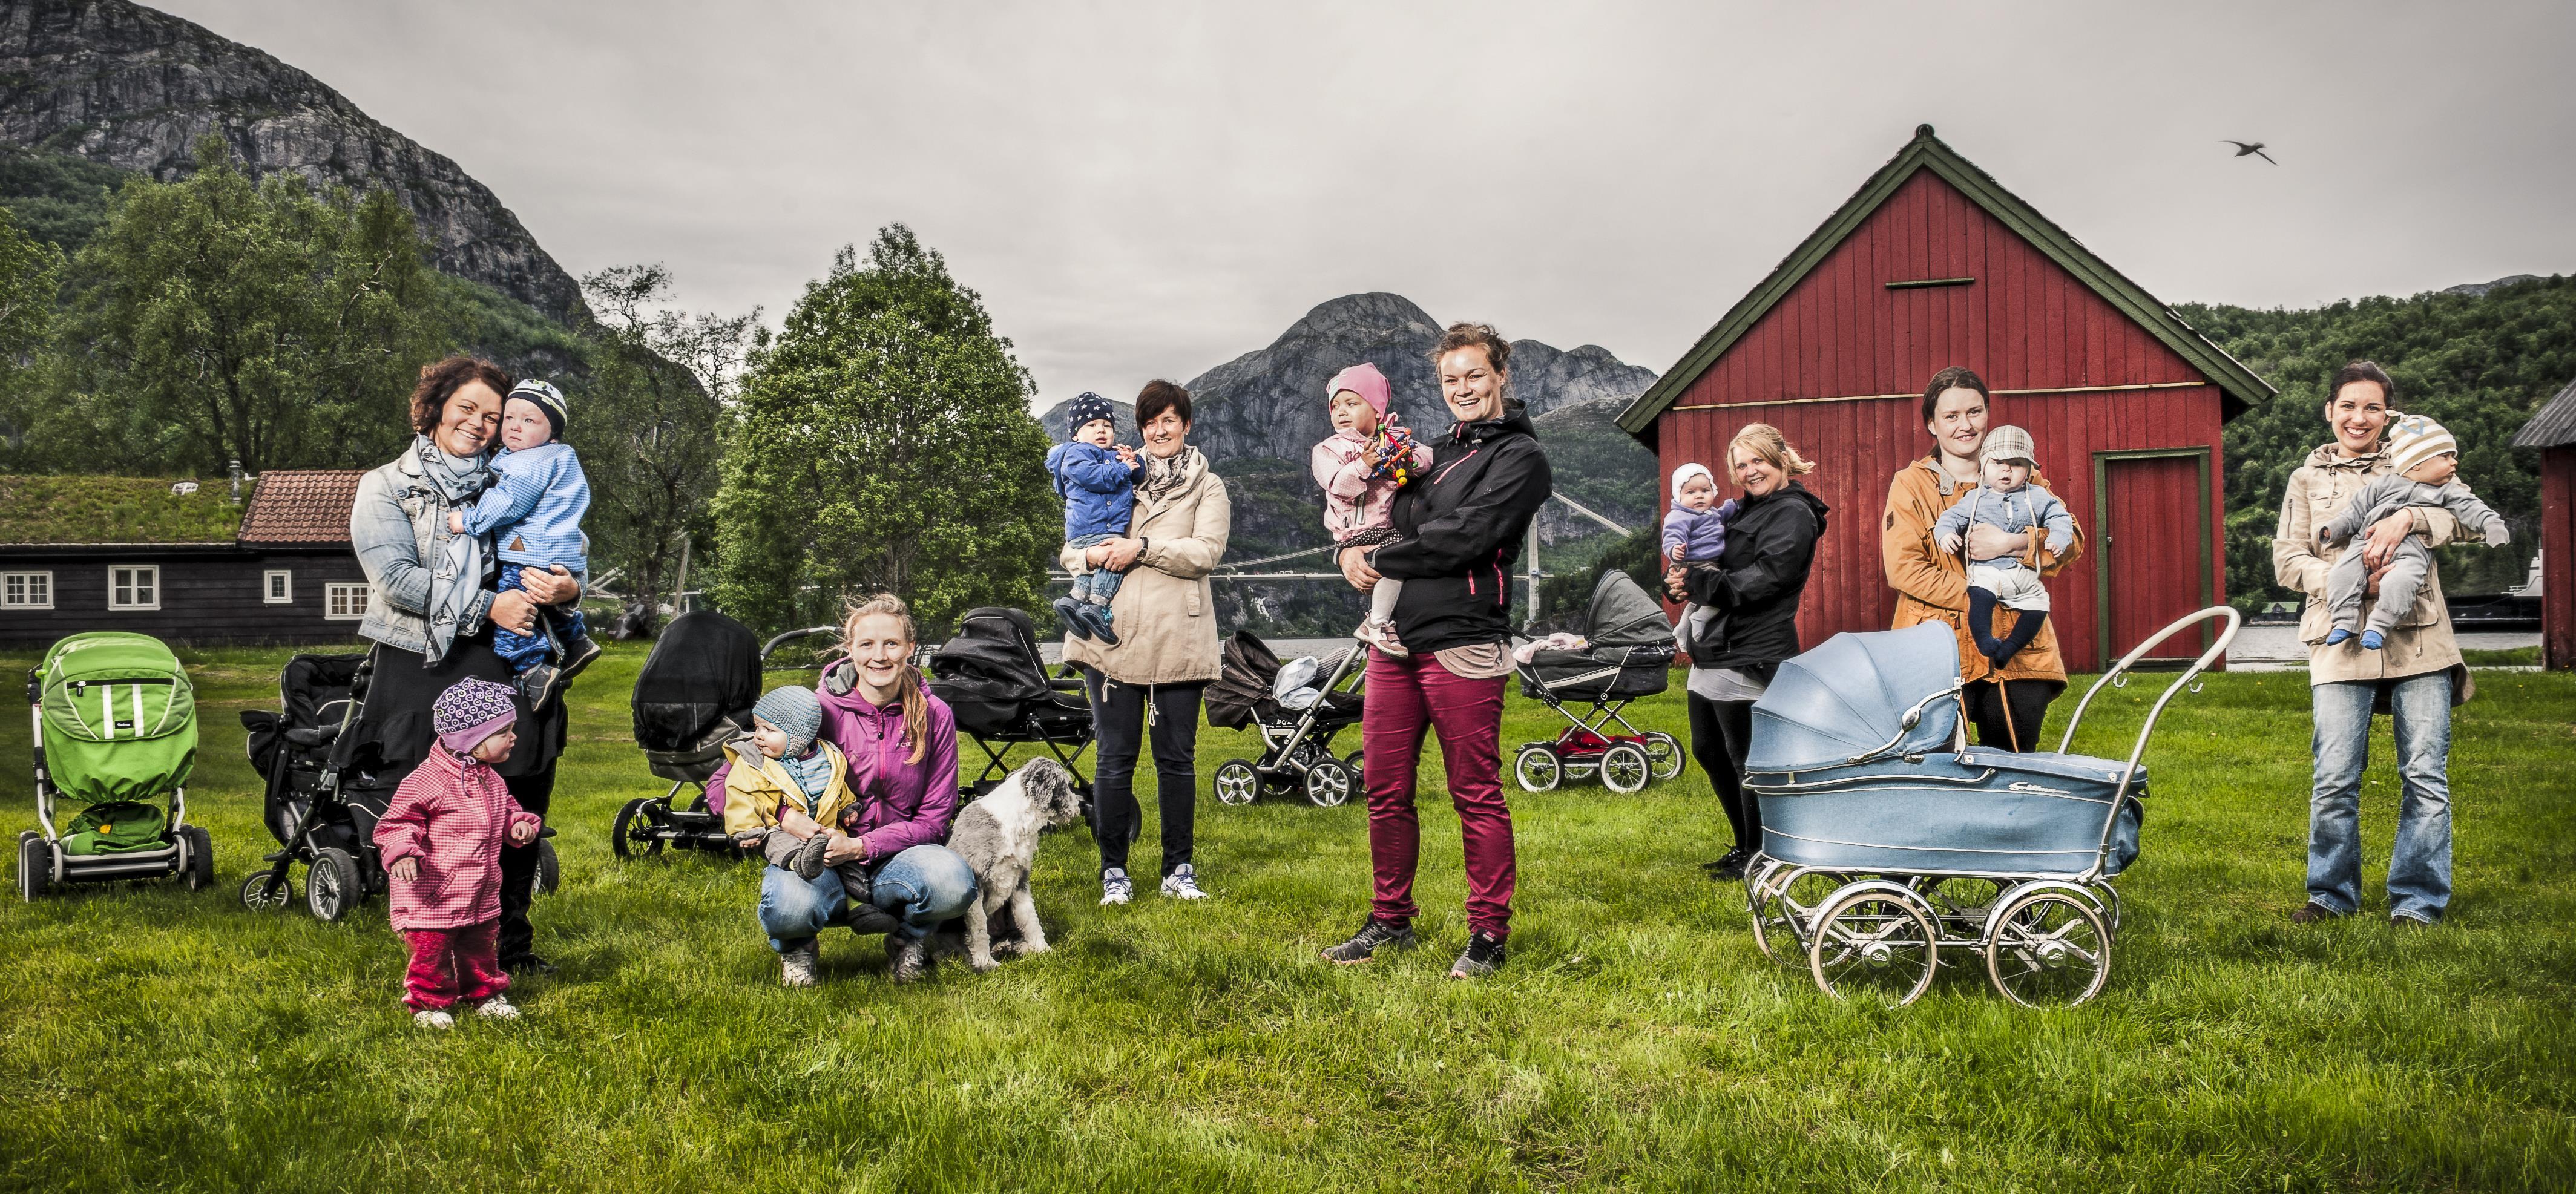 fjaler kommune kart Barn, unge og familie   Fjaler kommune